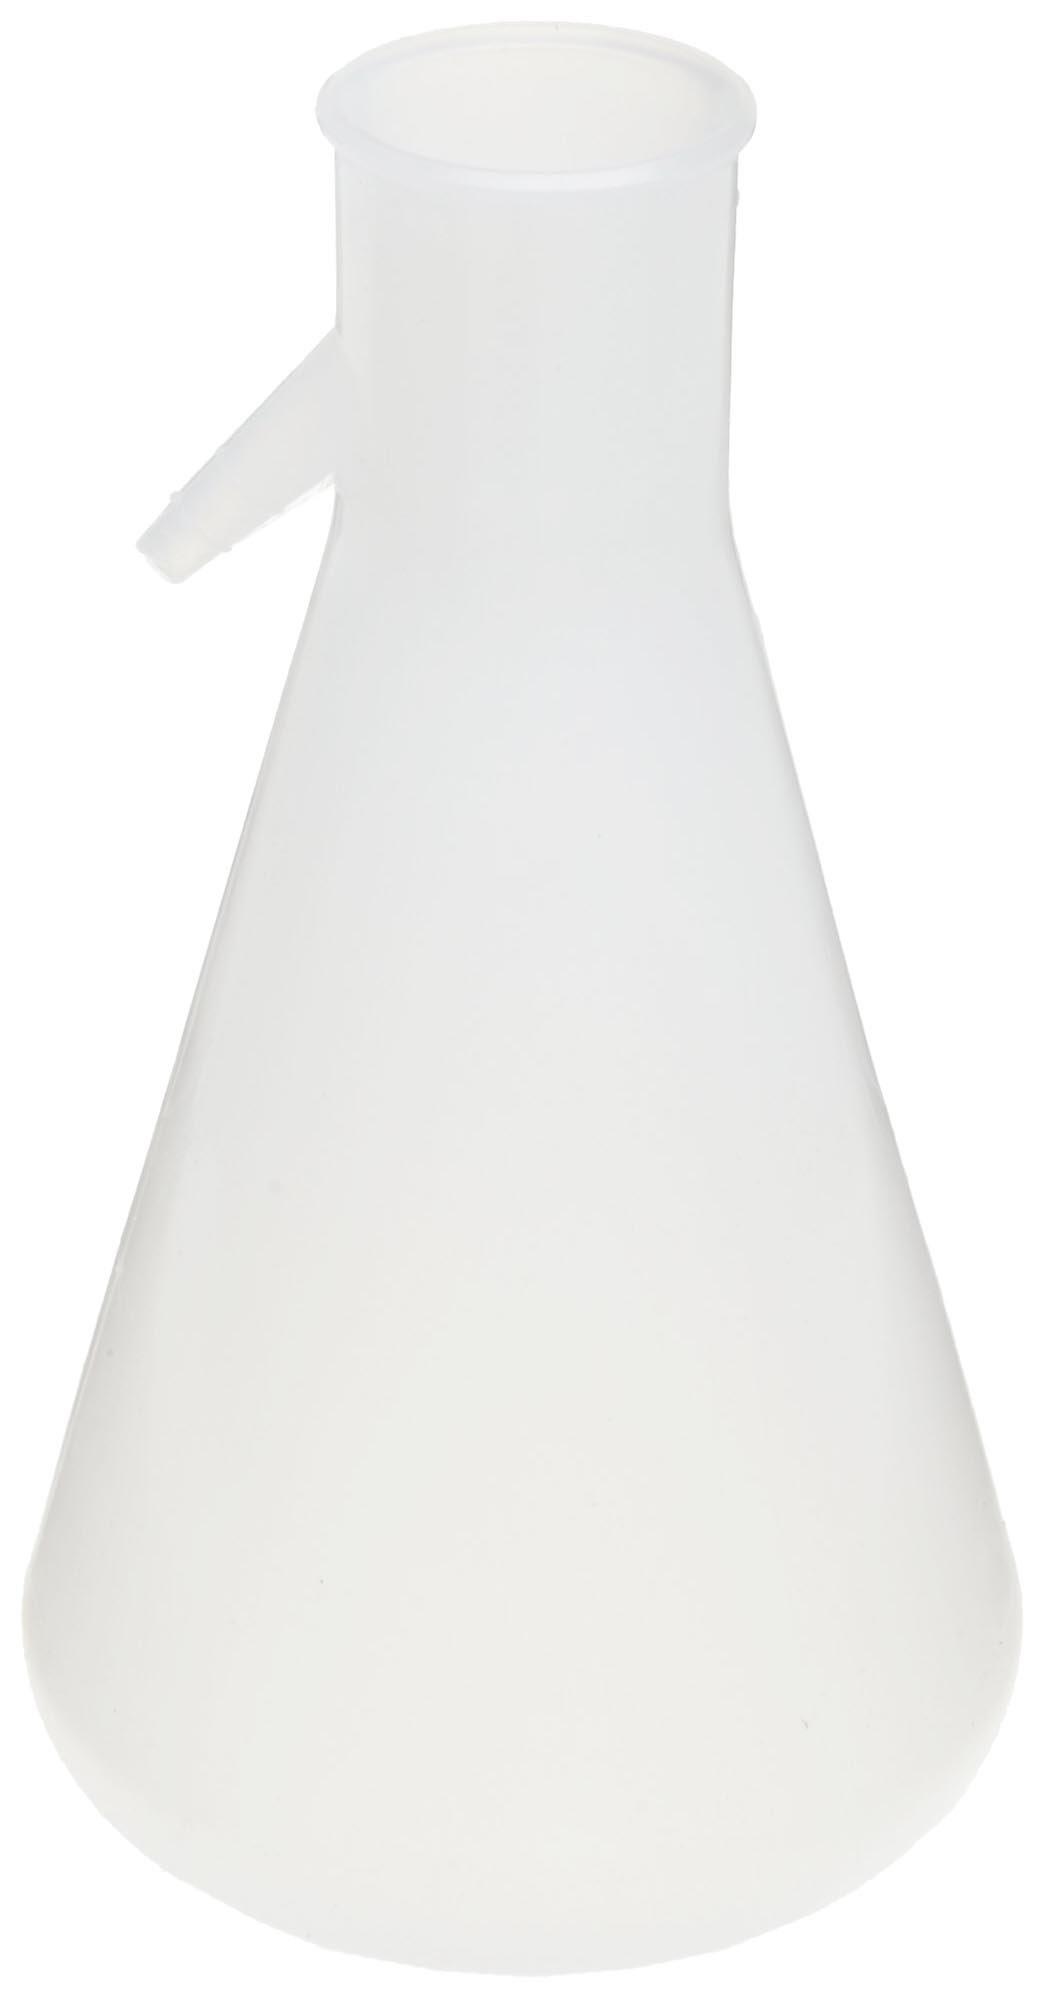 Nalgene DS4101-0500 Polypropylene 500mL Filtering Flask with Angled Tubulation by Nalgene